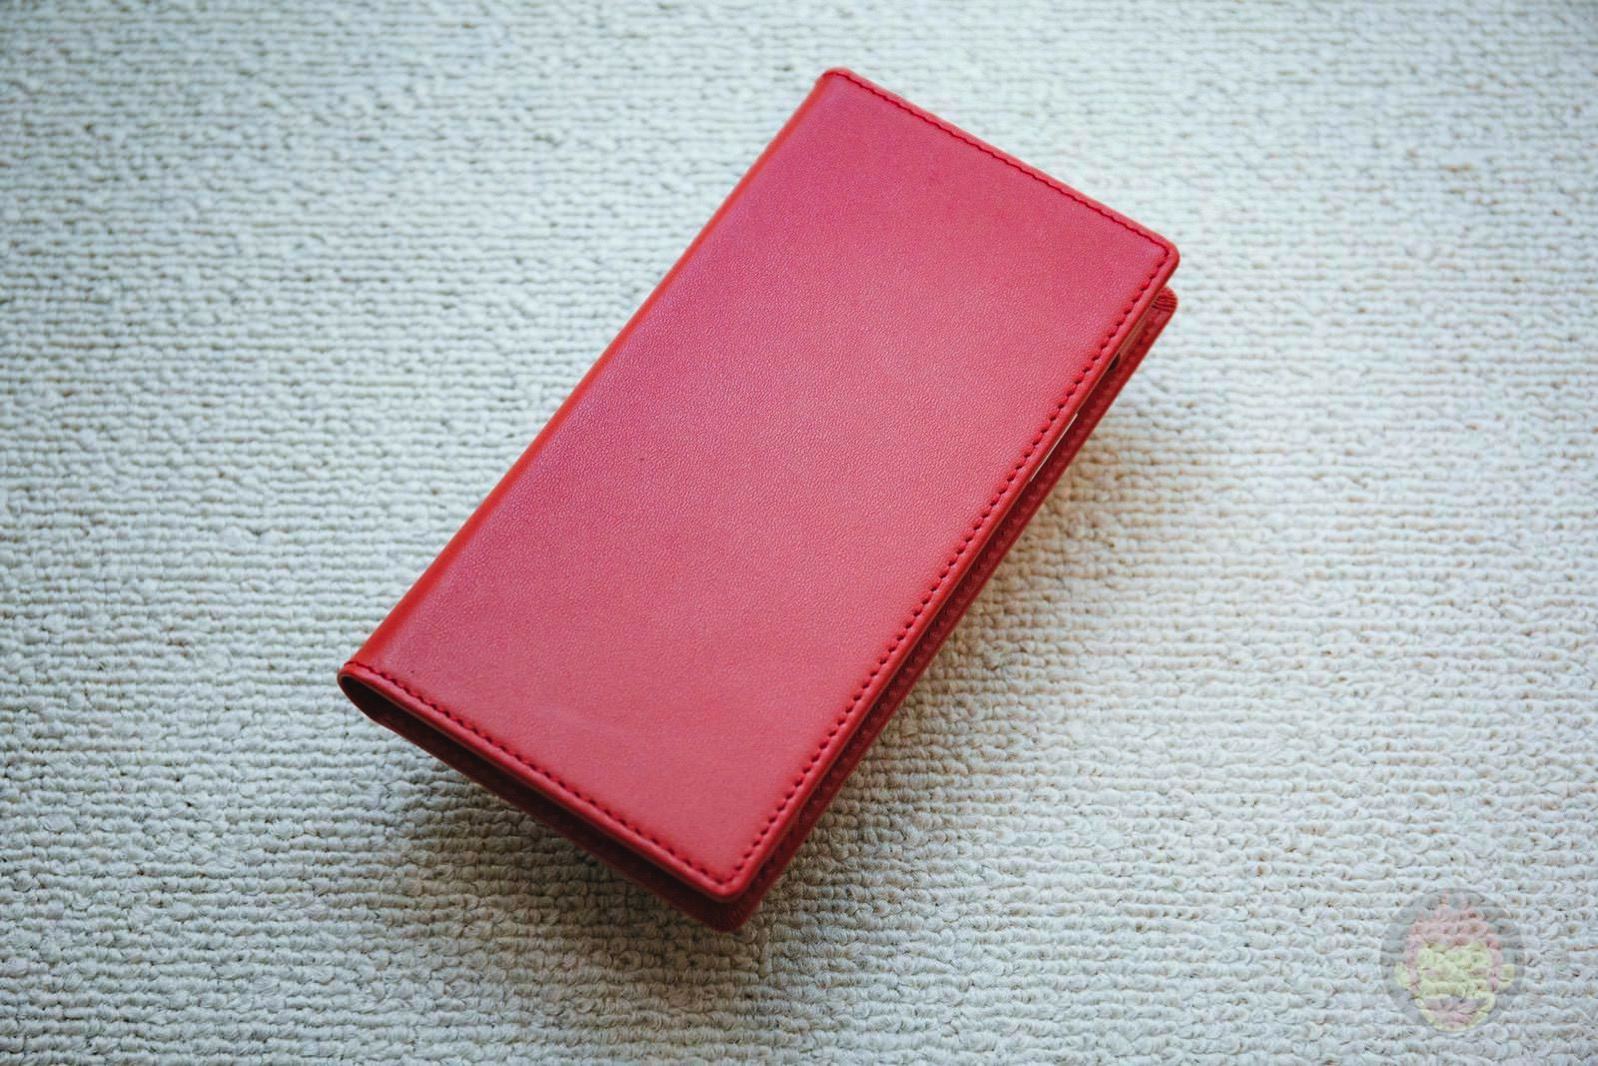 GRAMAS-Full-Leather-Case-Red-for-iPhoneX-SIM-PIN-03.jpg